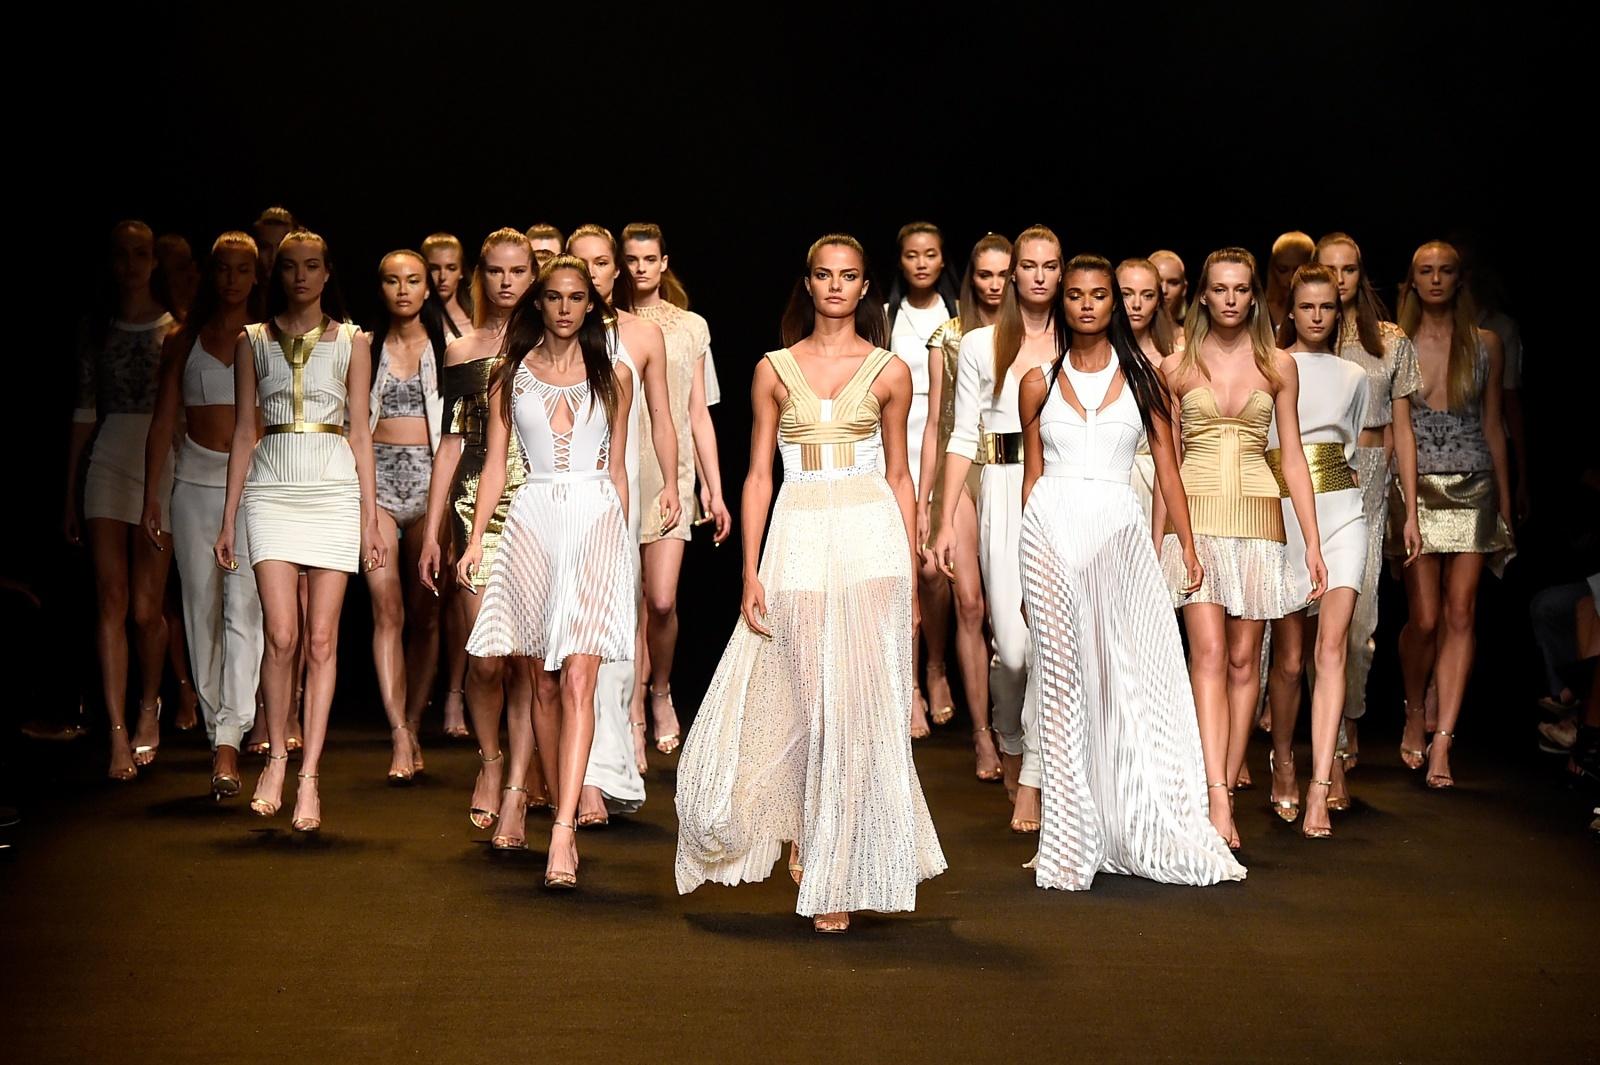 Unbridled fashion inspiration from New York Fashion Week ...